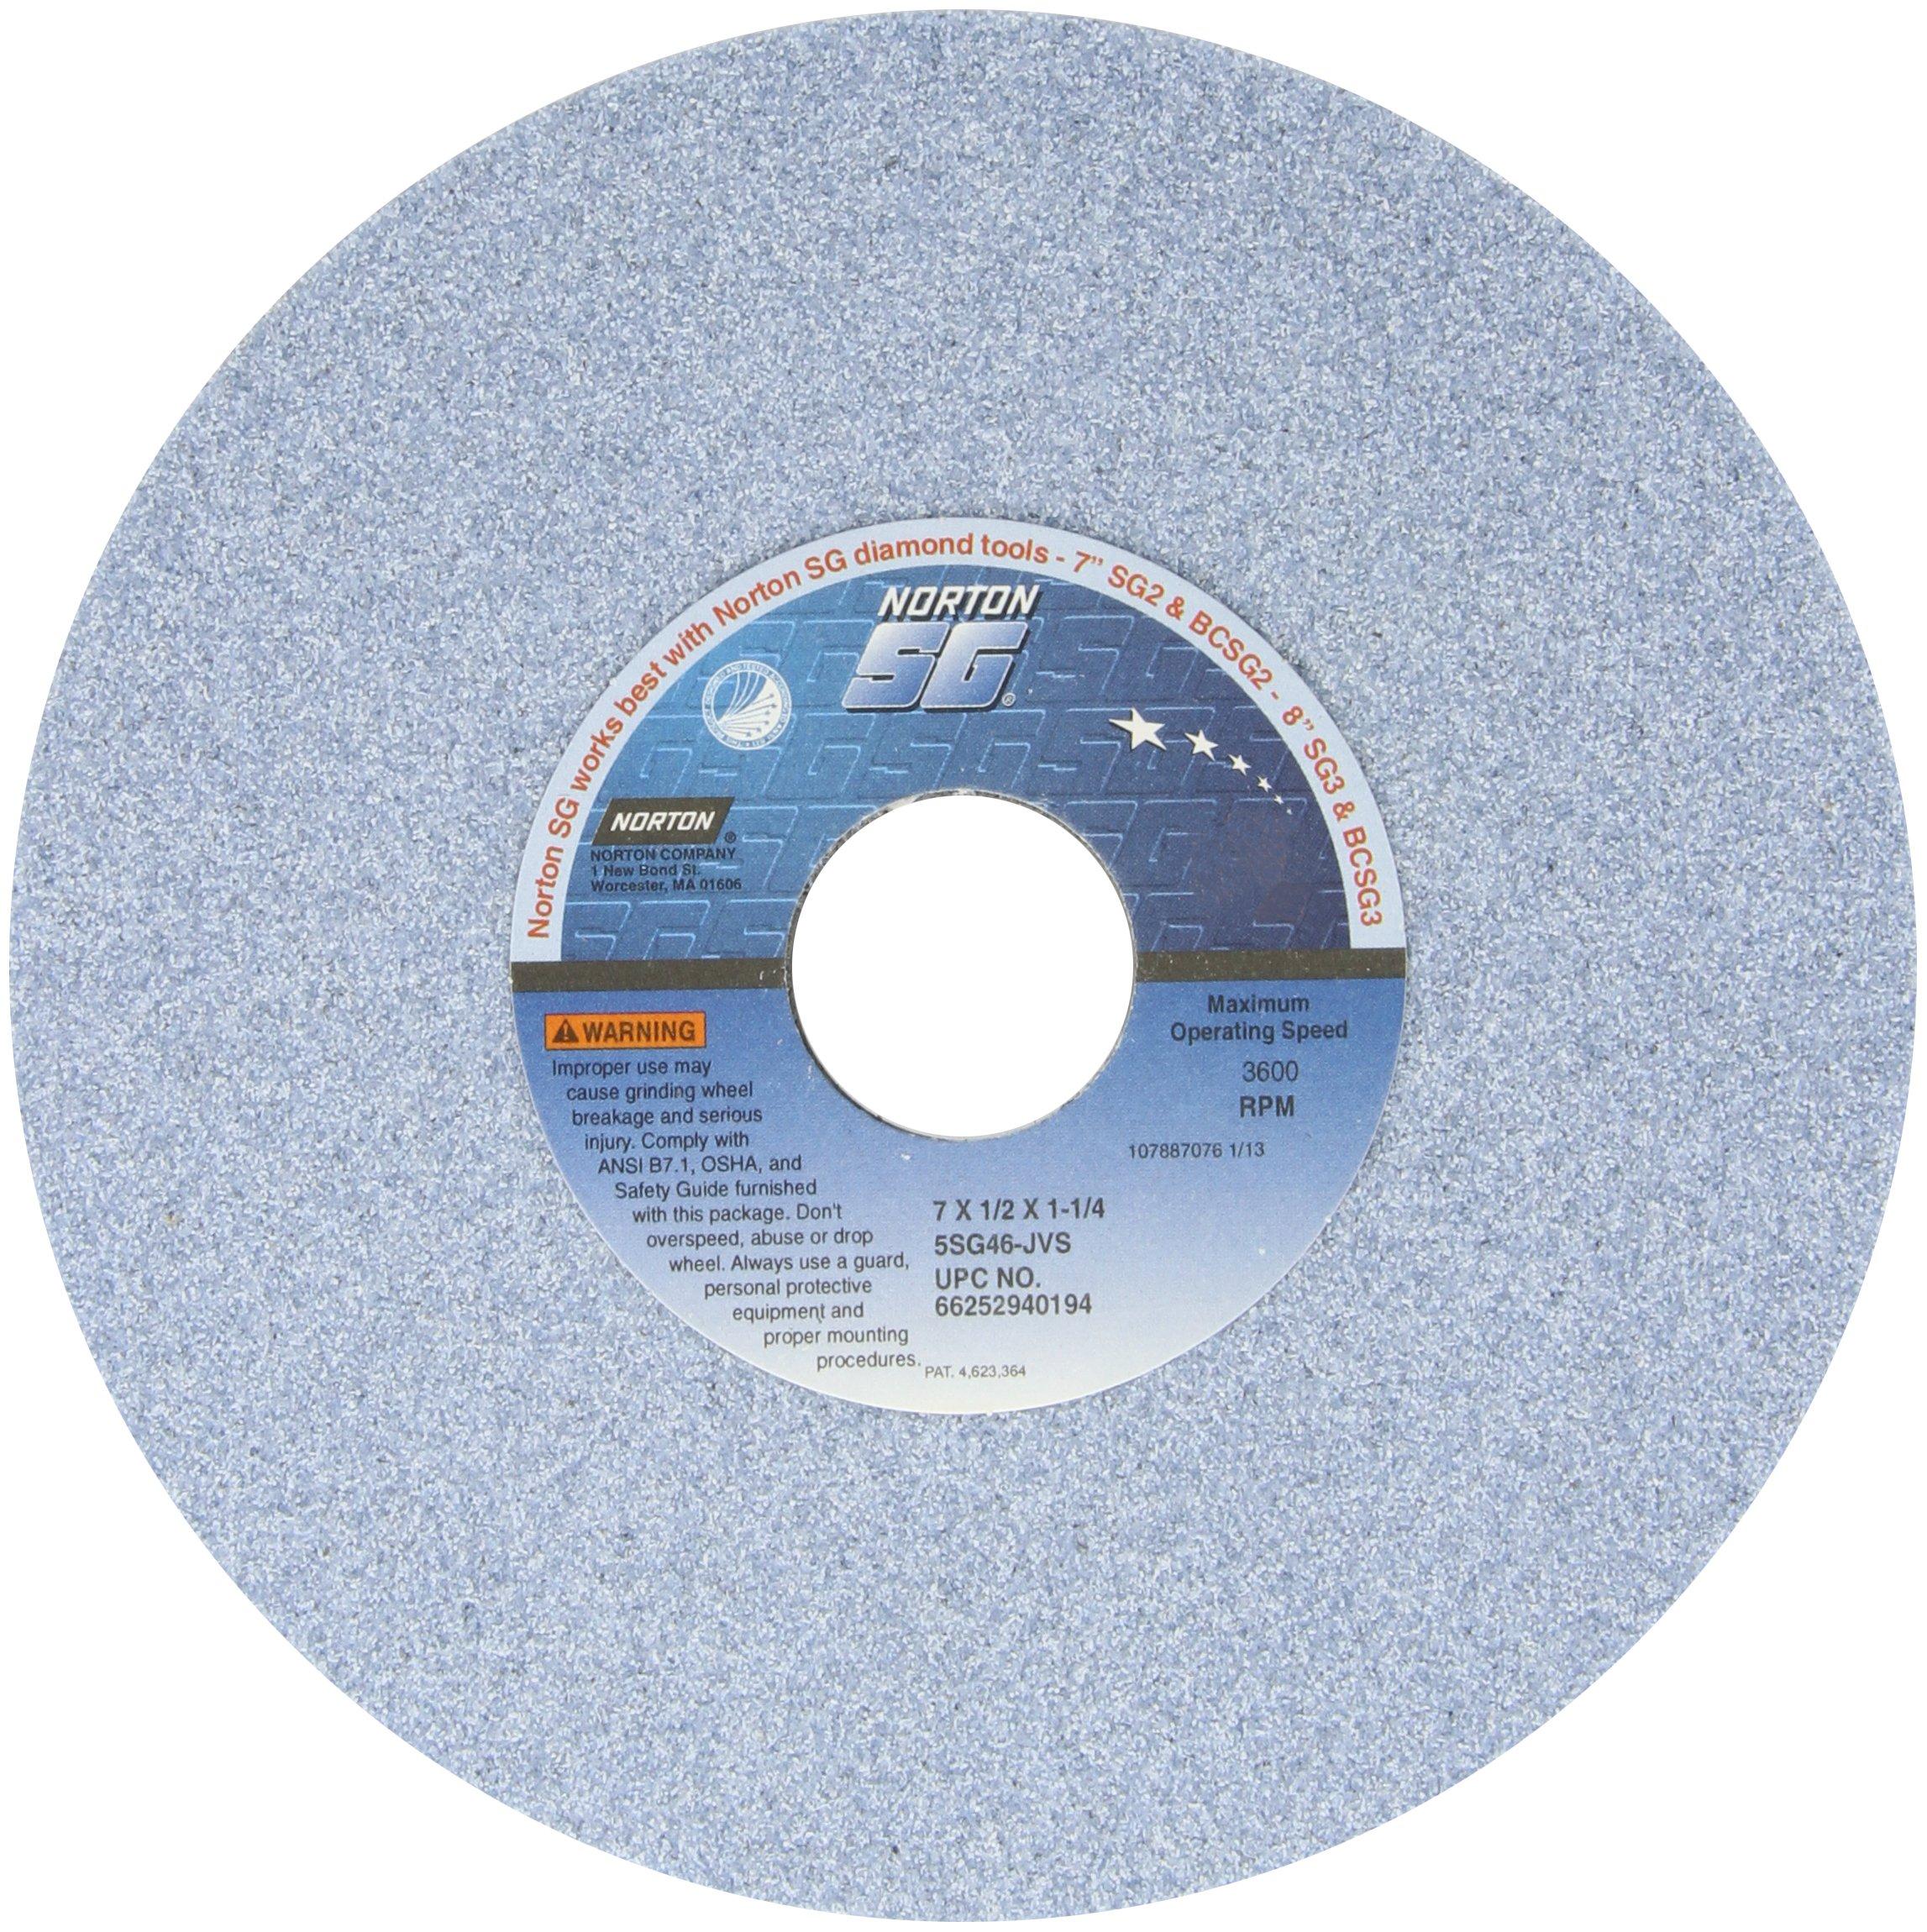 Norton 5SG Vitrified Toolroom Abrasive Wheel, Type 1 Straight, Ceramic Aluminum Oxide, 1-1/4'' Arbor, 7'' Diameter, 1/2'' Thickness, 46-J Grit (Pack of 1)